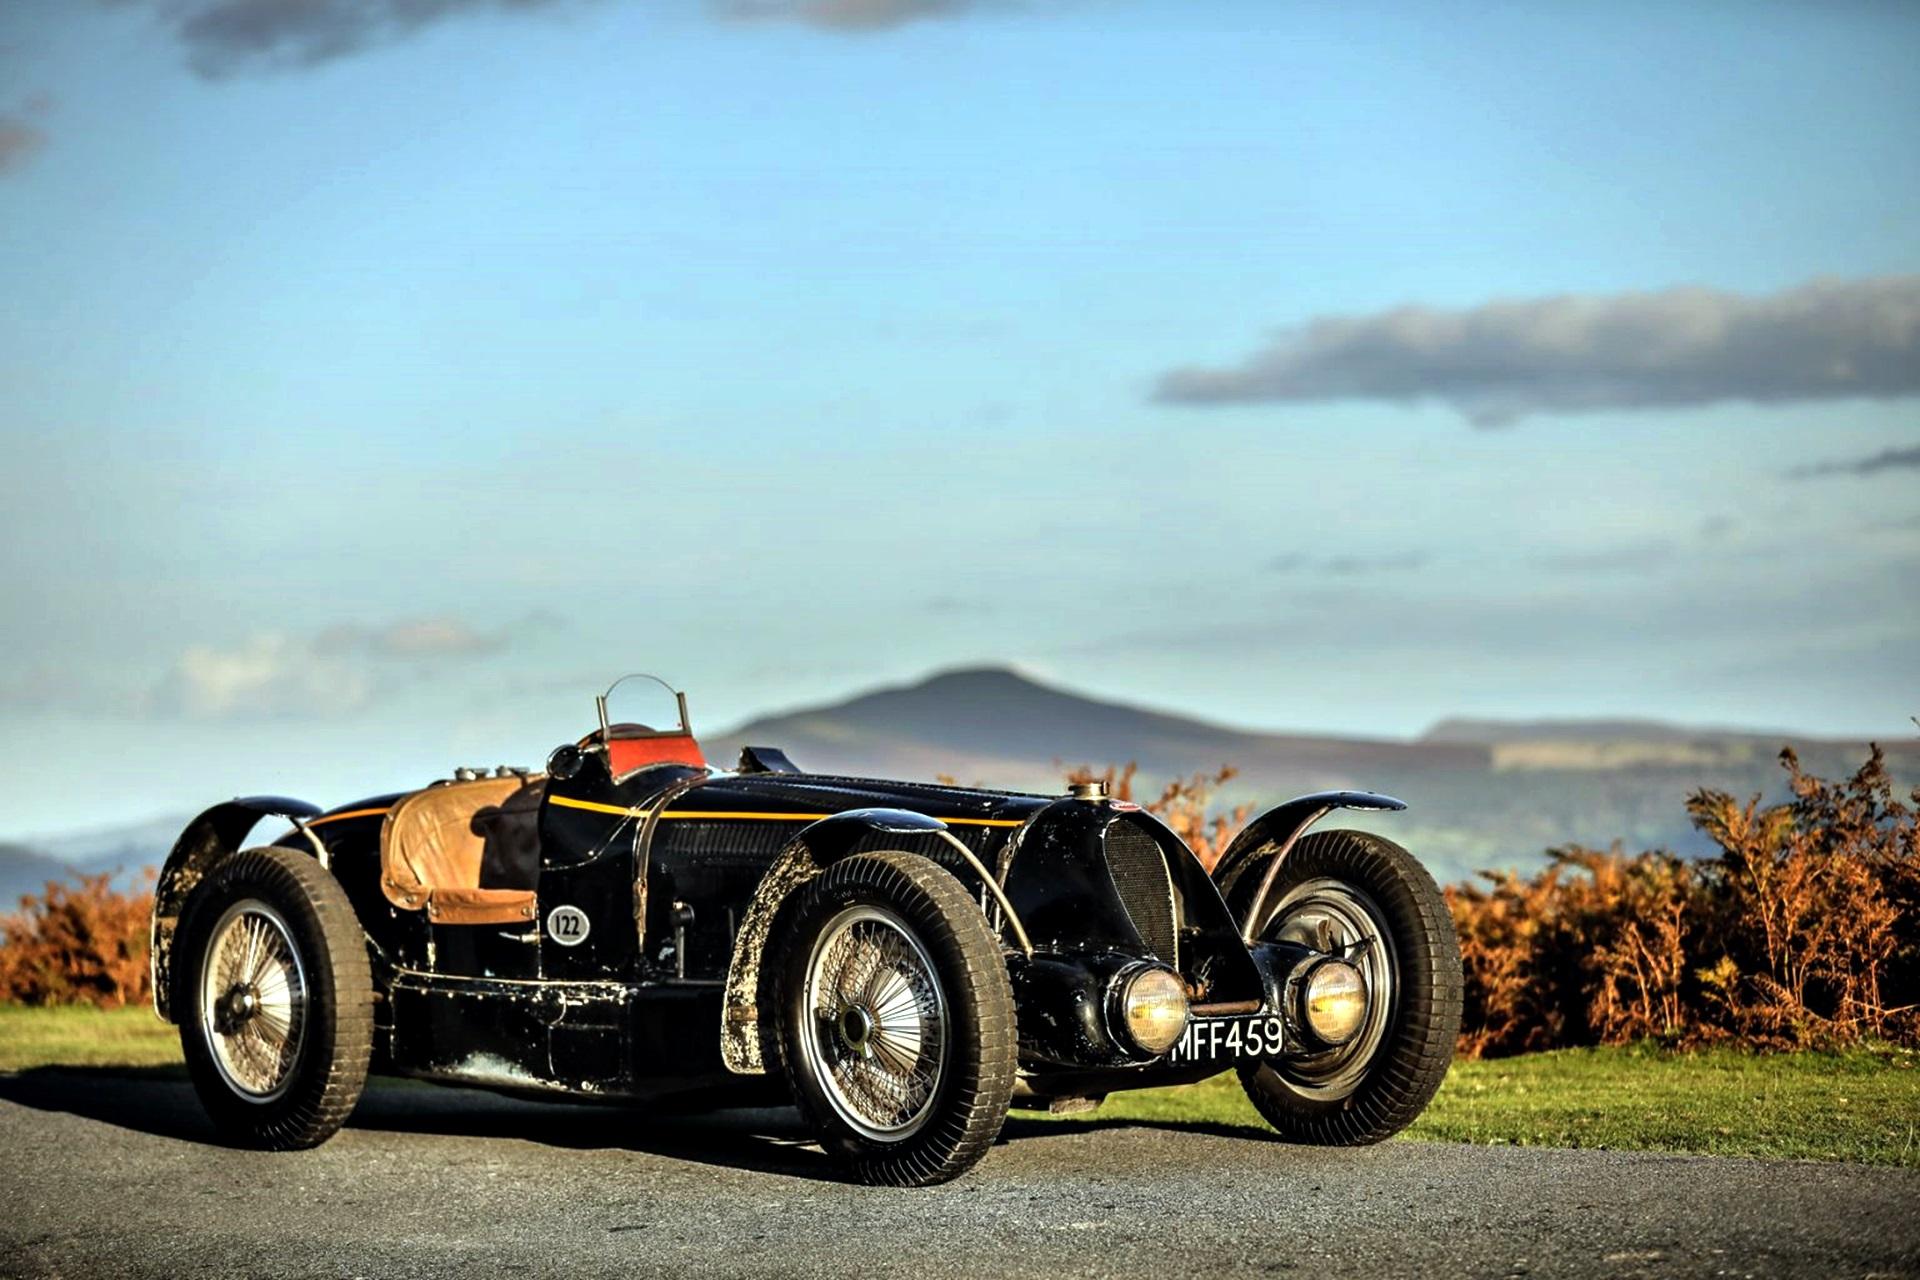 1. 1934 Bugatti Type 59 Sports 07 Gooding And Company Mathieu Heurtault